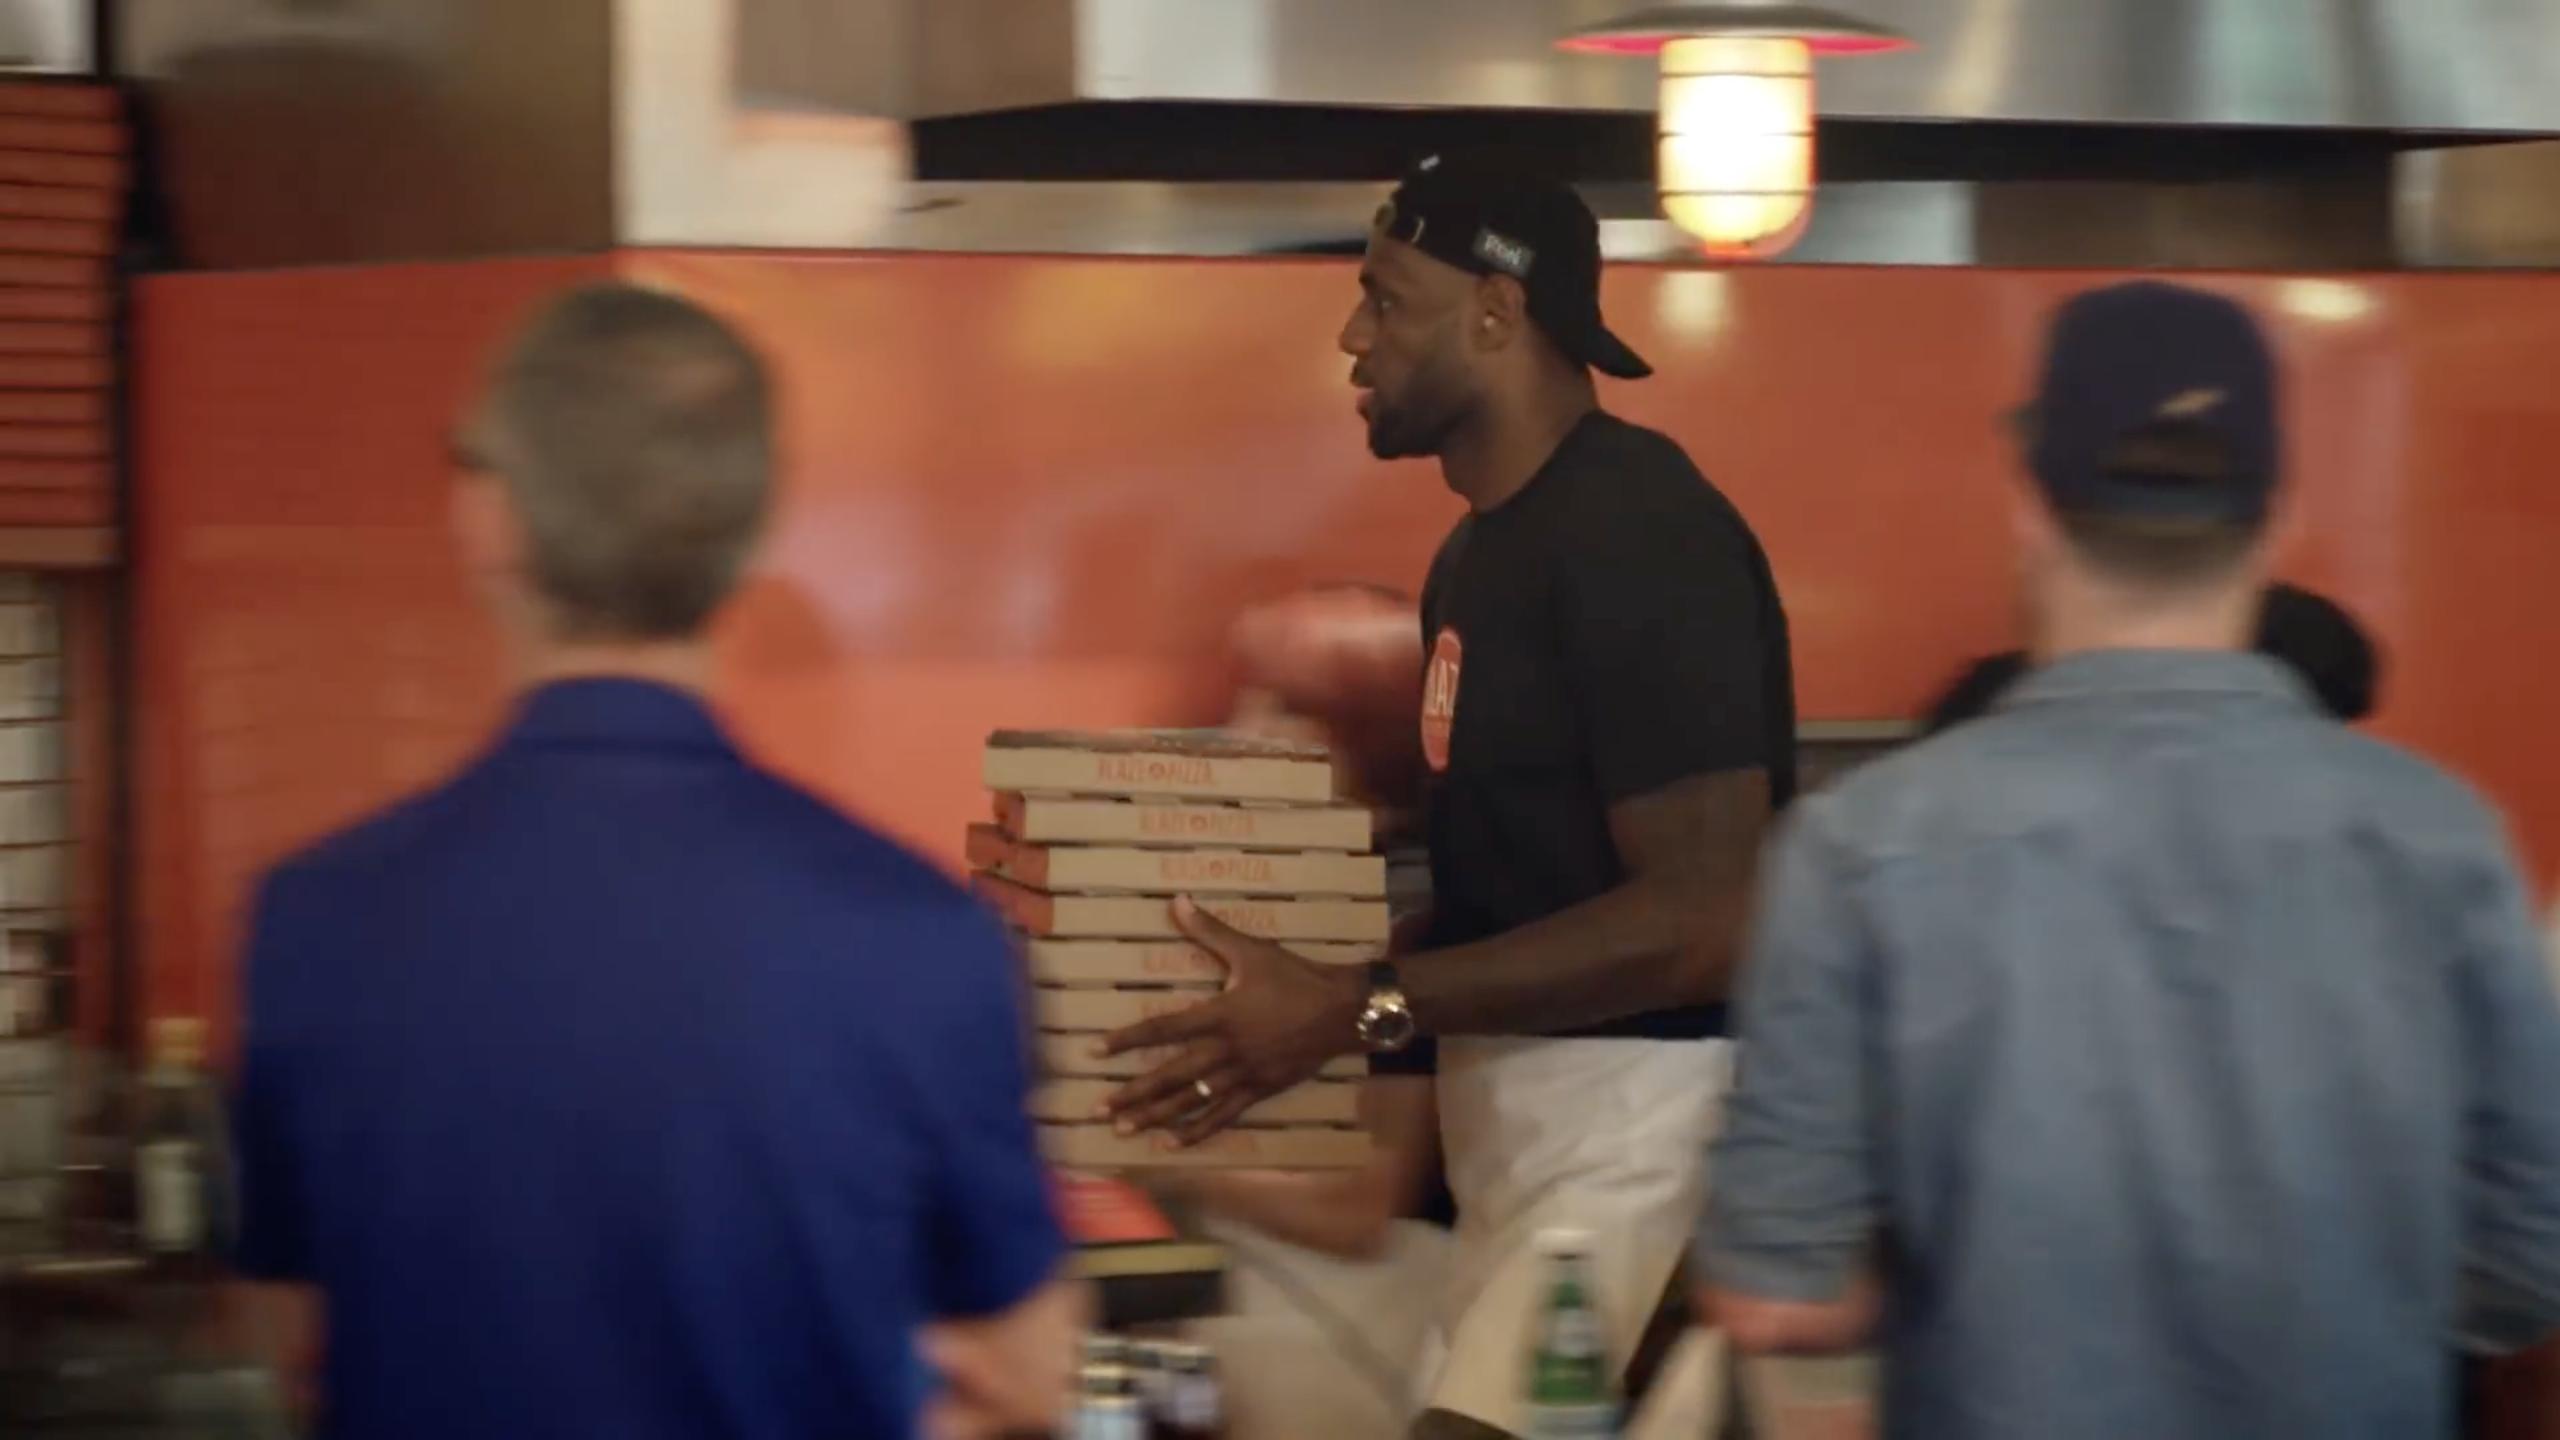 LeBron James at Blaze Pizza, Pasadena